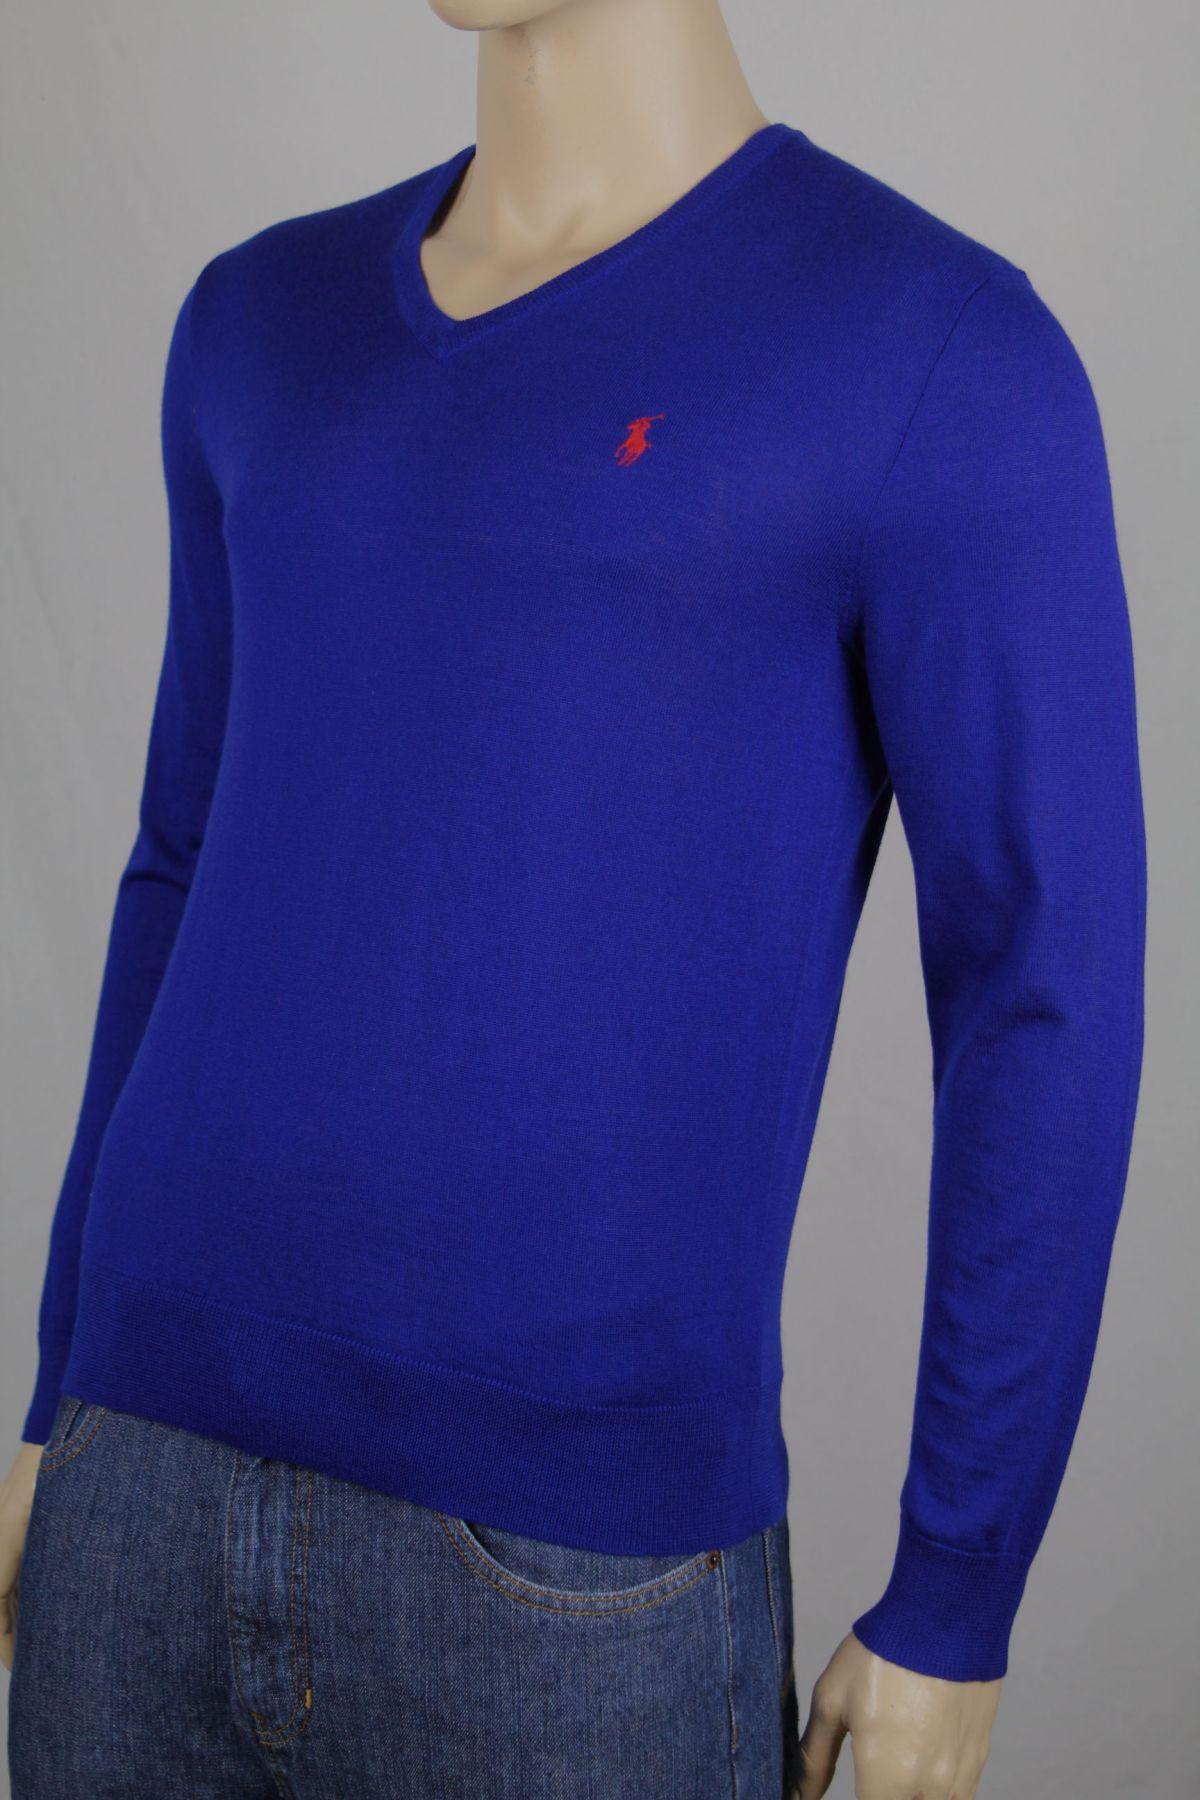 Ralph Lauren Herren Pullover Slim Fit Merino Wolle blau me